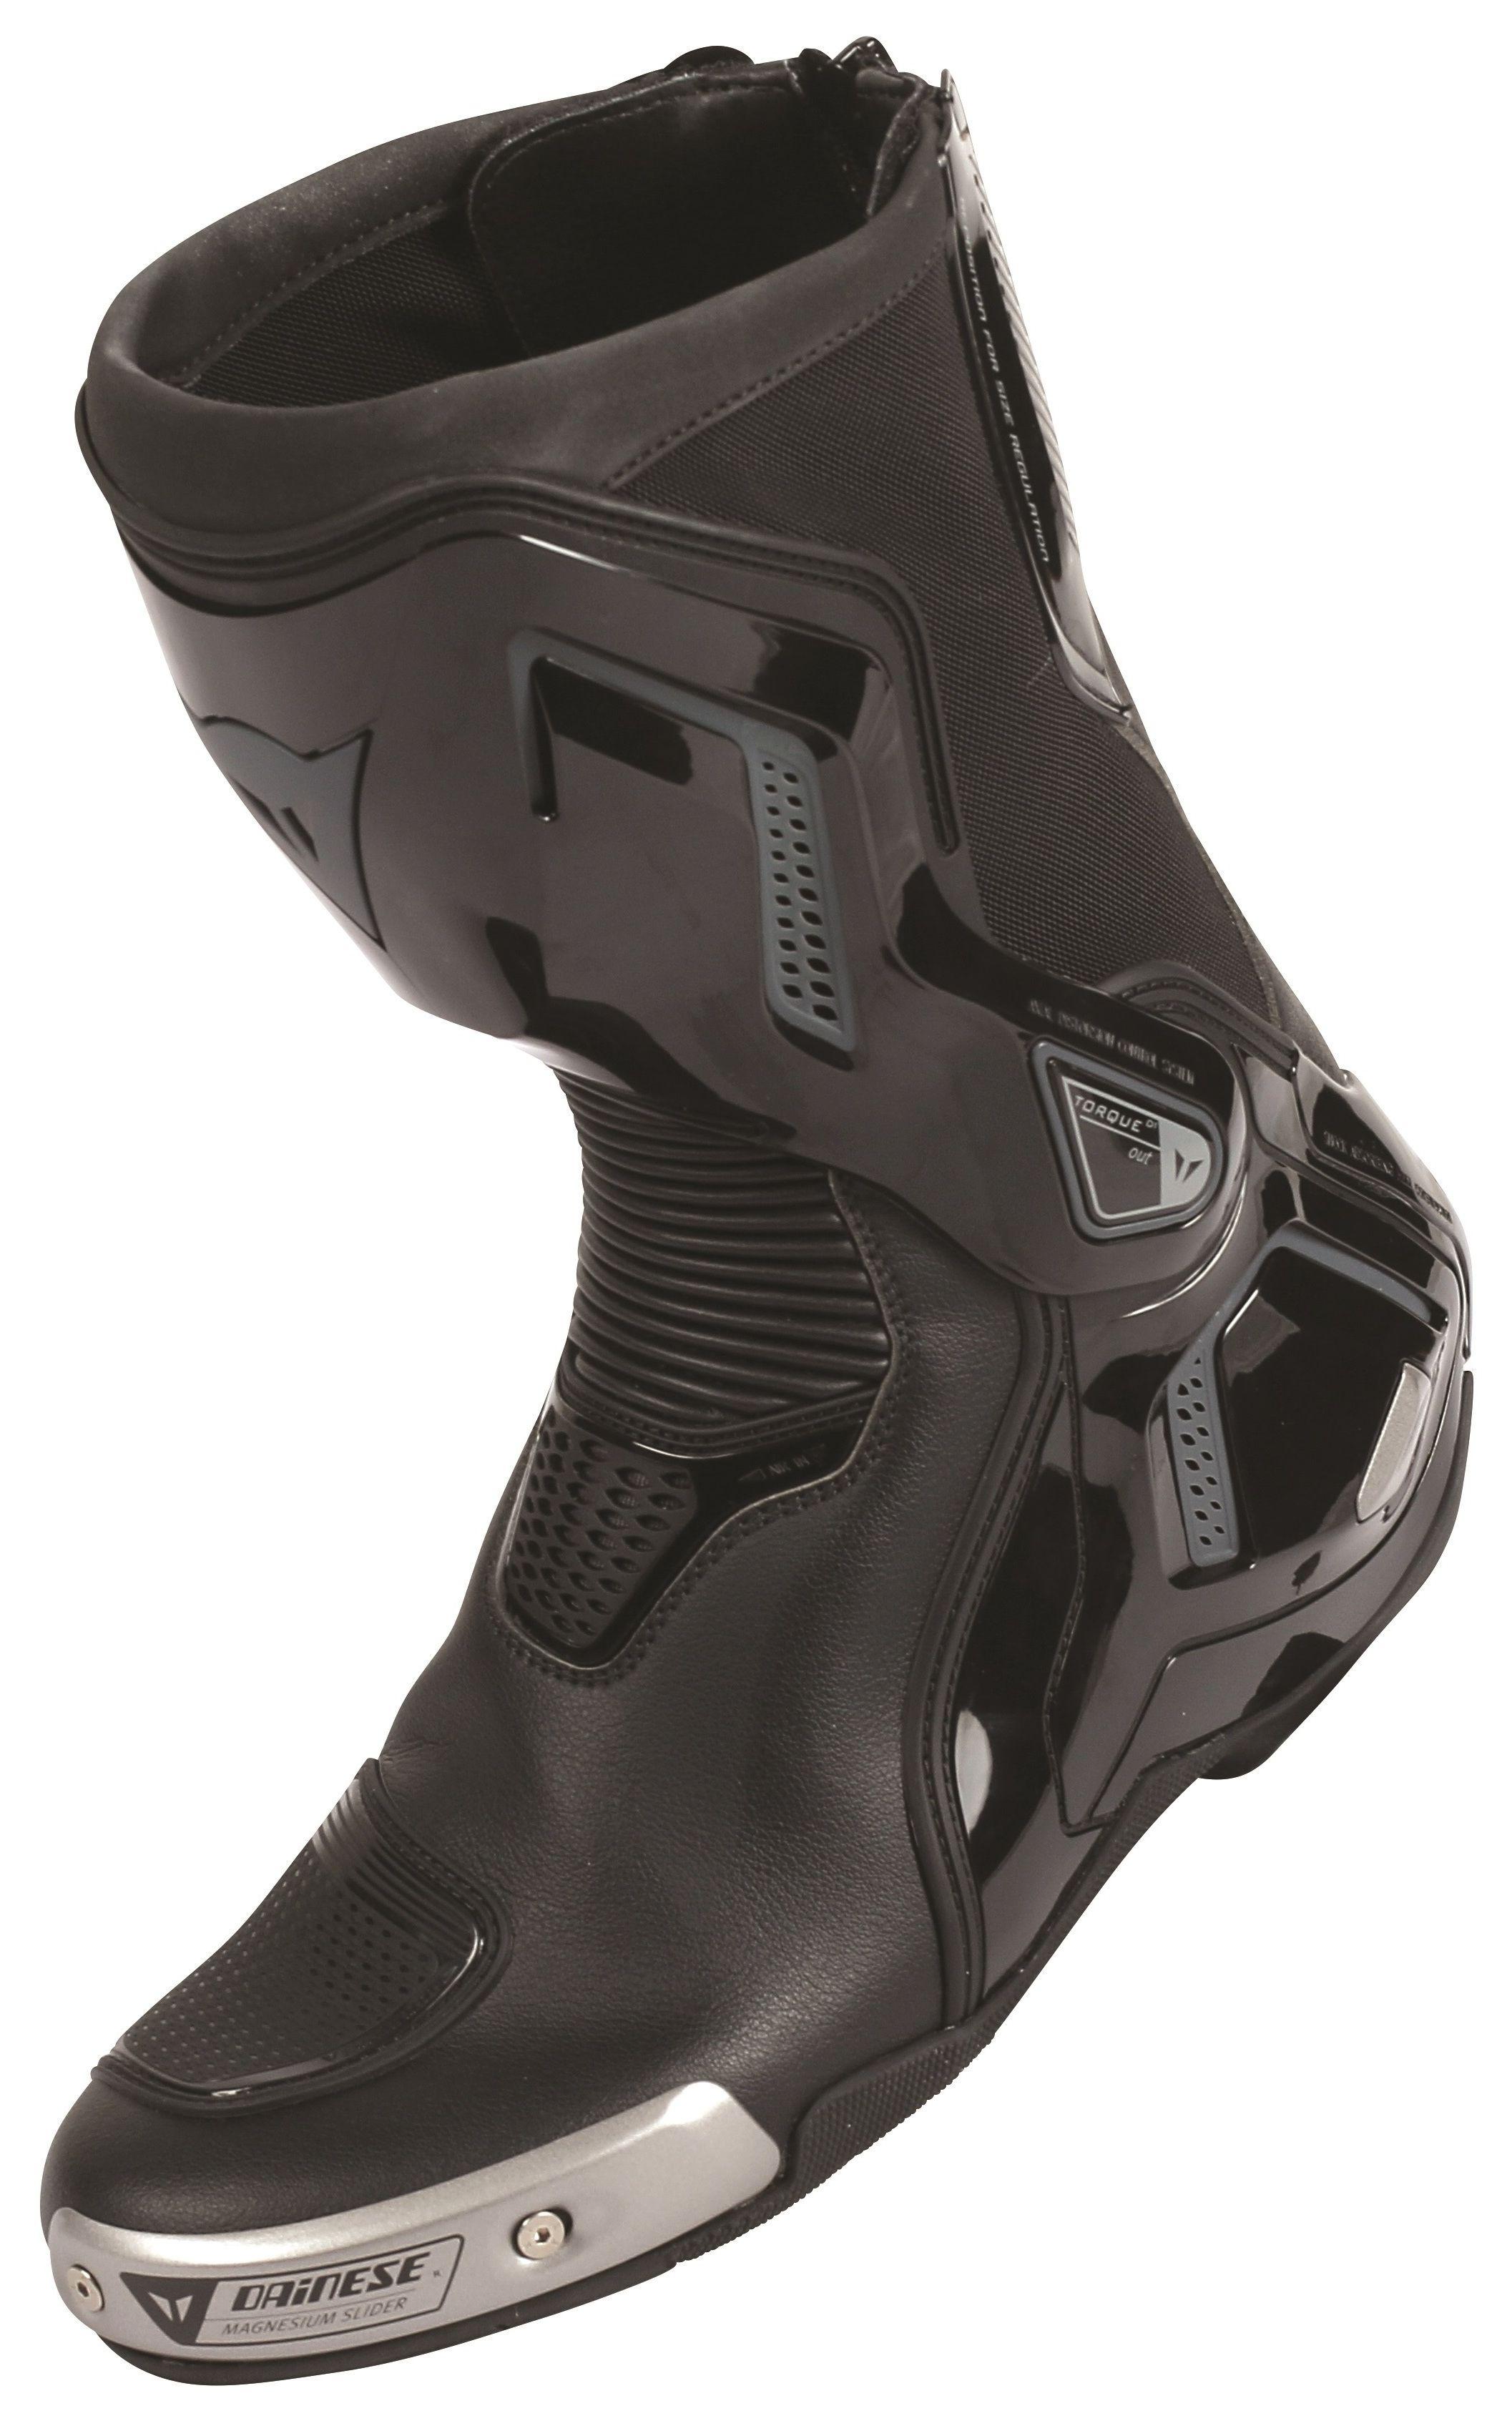 dainese torque d1 air boots revzilla. Black Bedroom Furniture Sets. Home Design Ideas